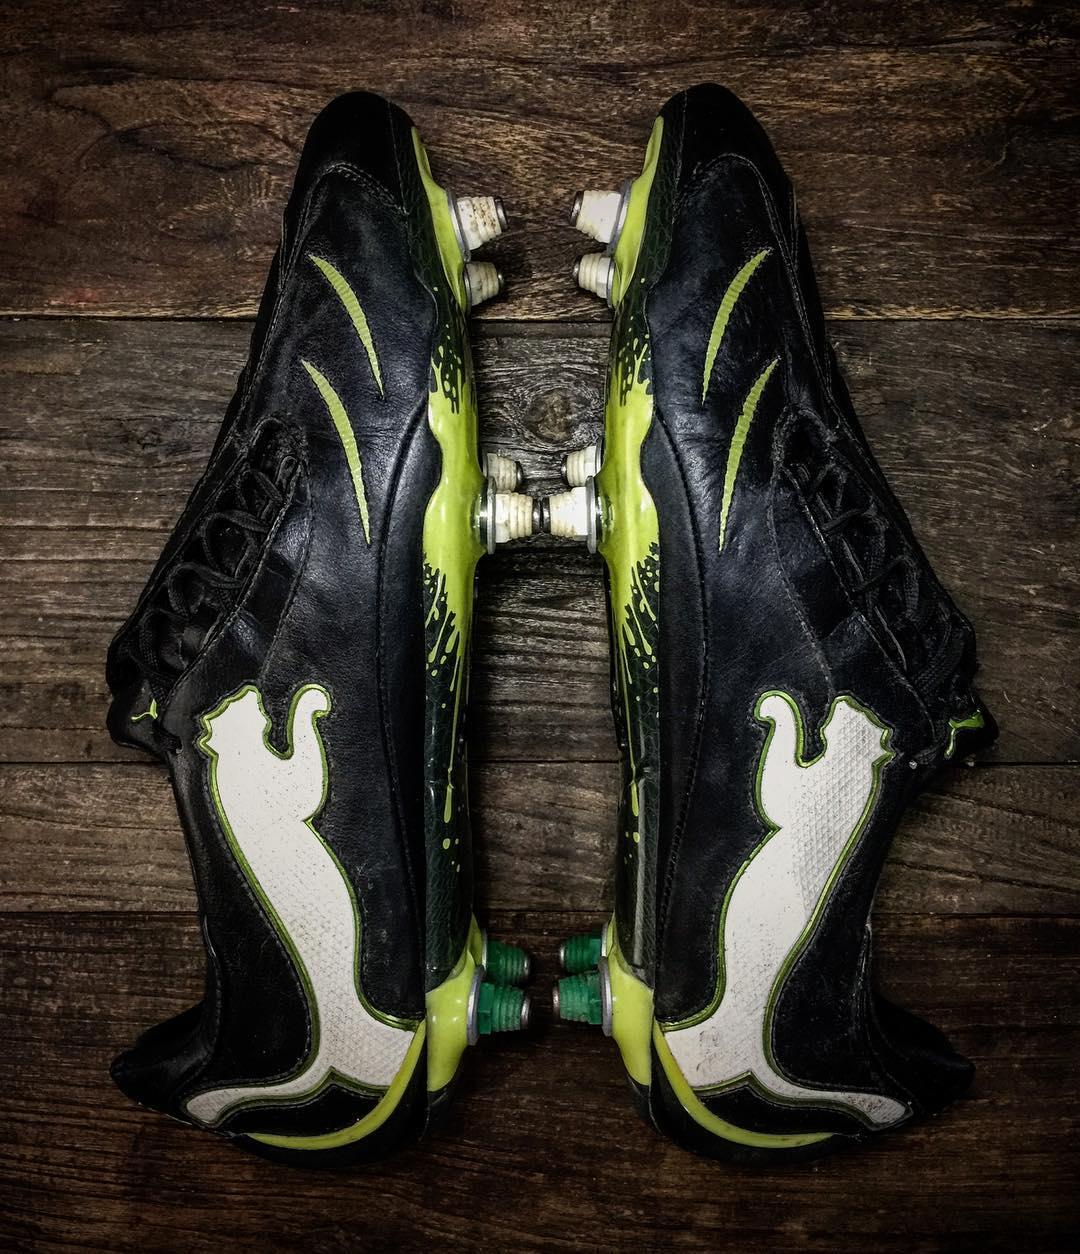 collection-chaussures-de-foot-joueurs-3